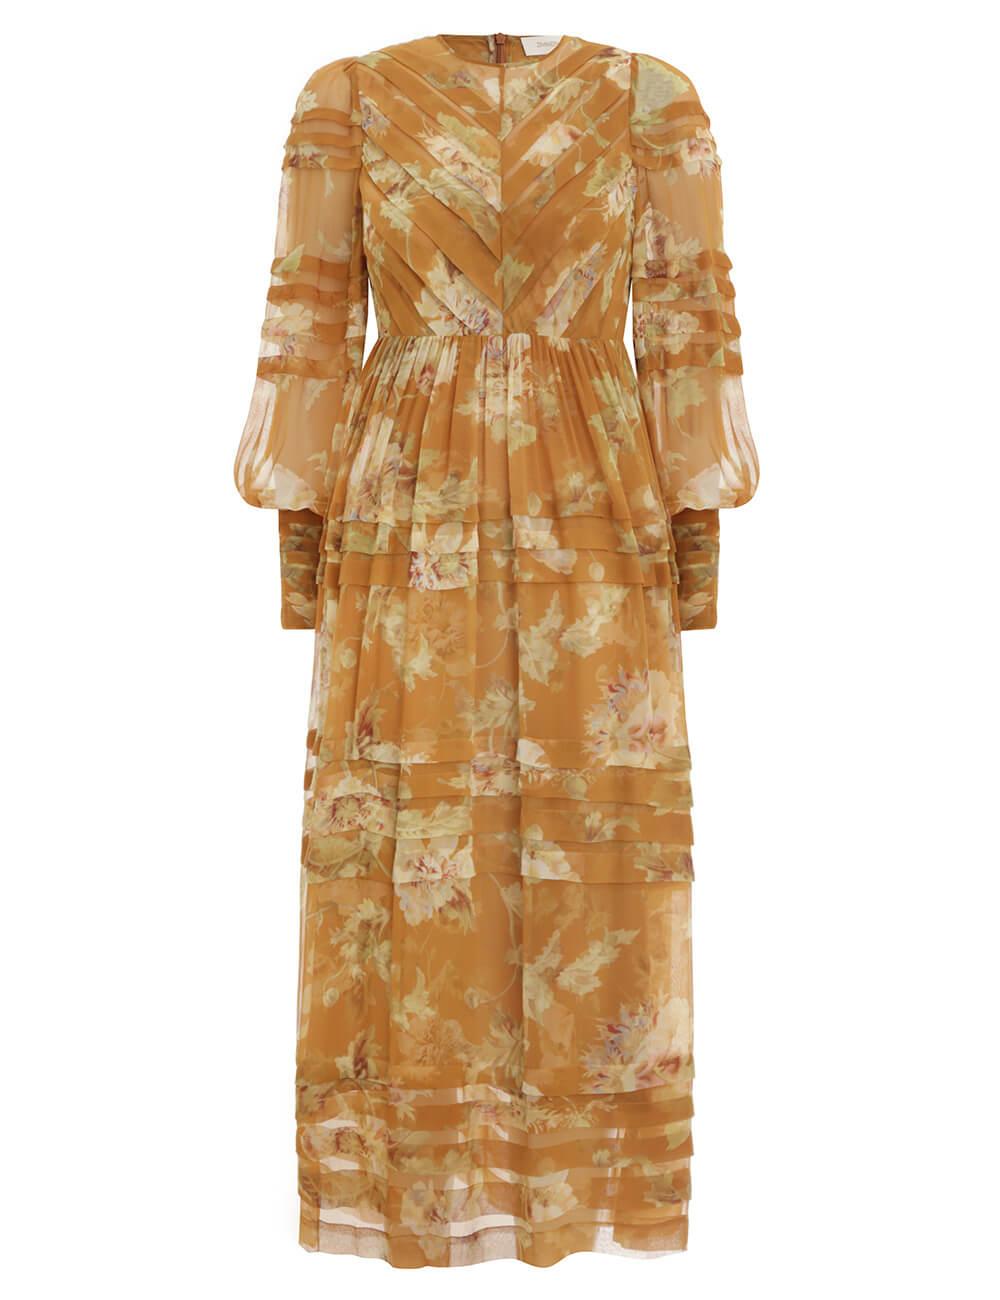 Sabotage Folded Tuck Dress